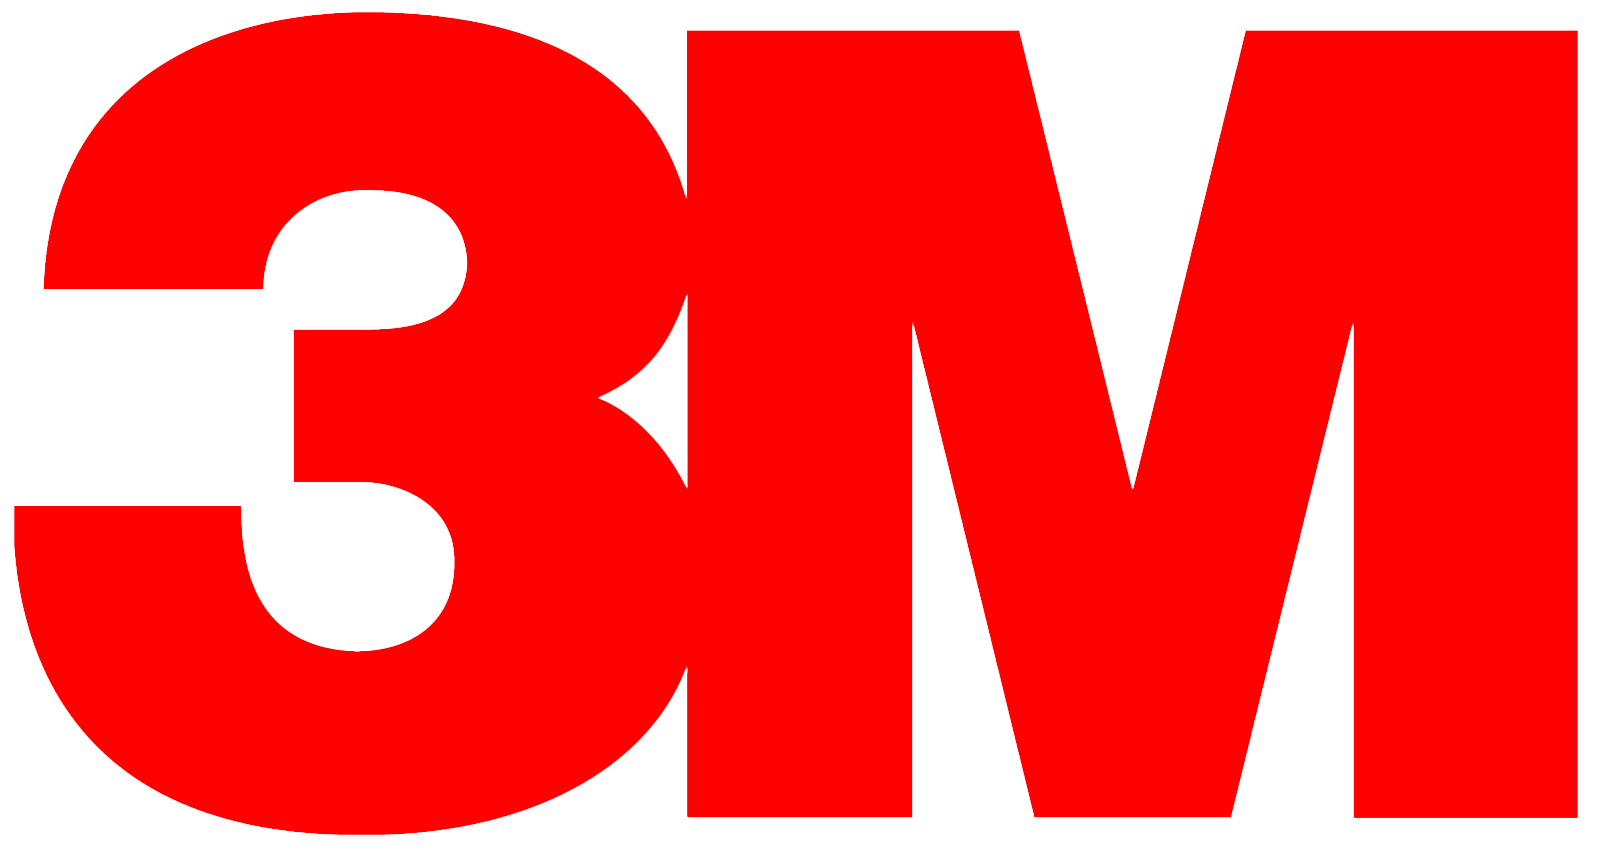 v l 3M logo